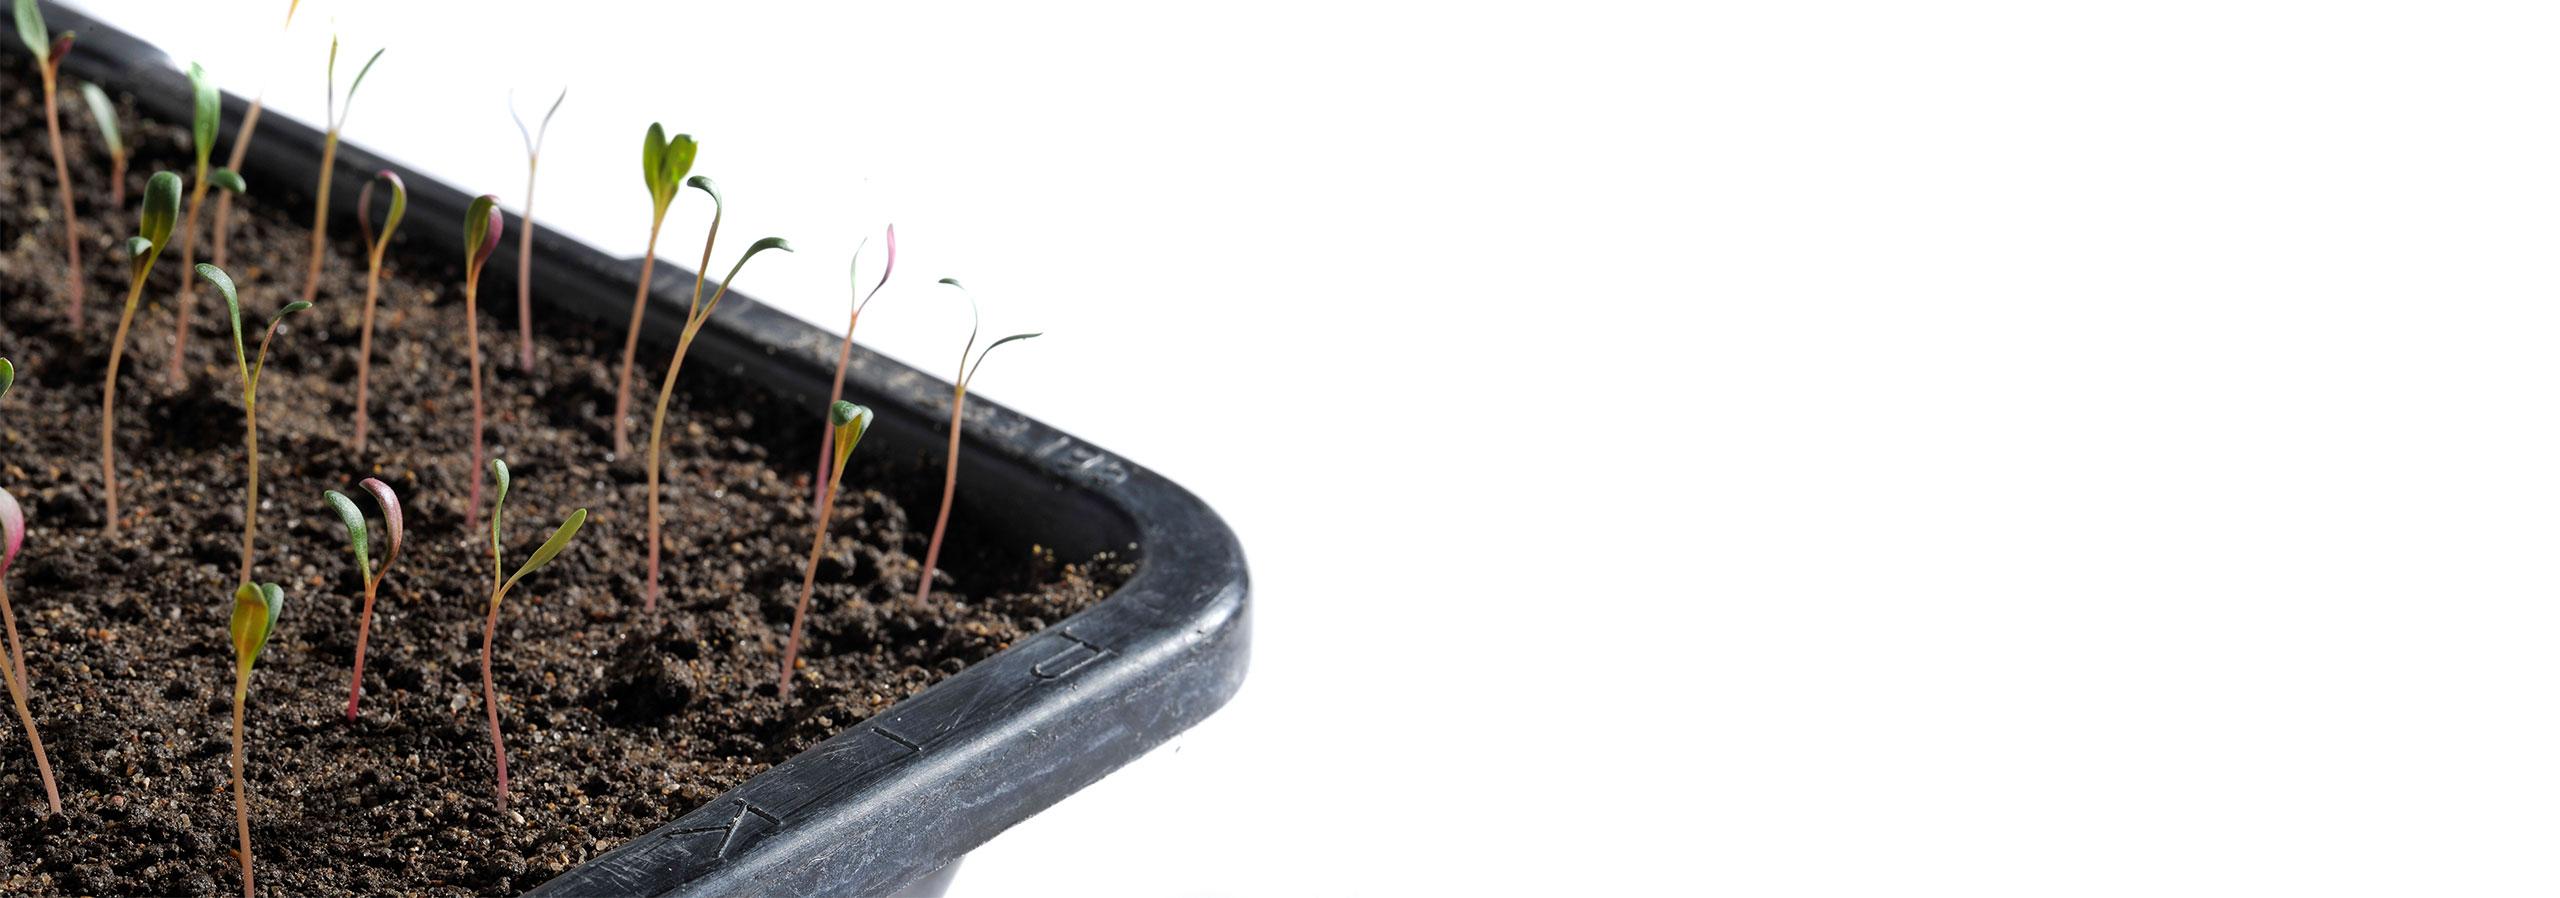 Pflanzenschutz/-stärkung